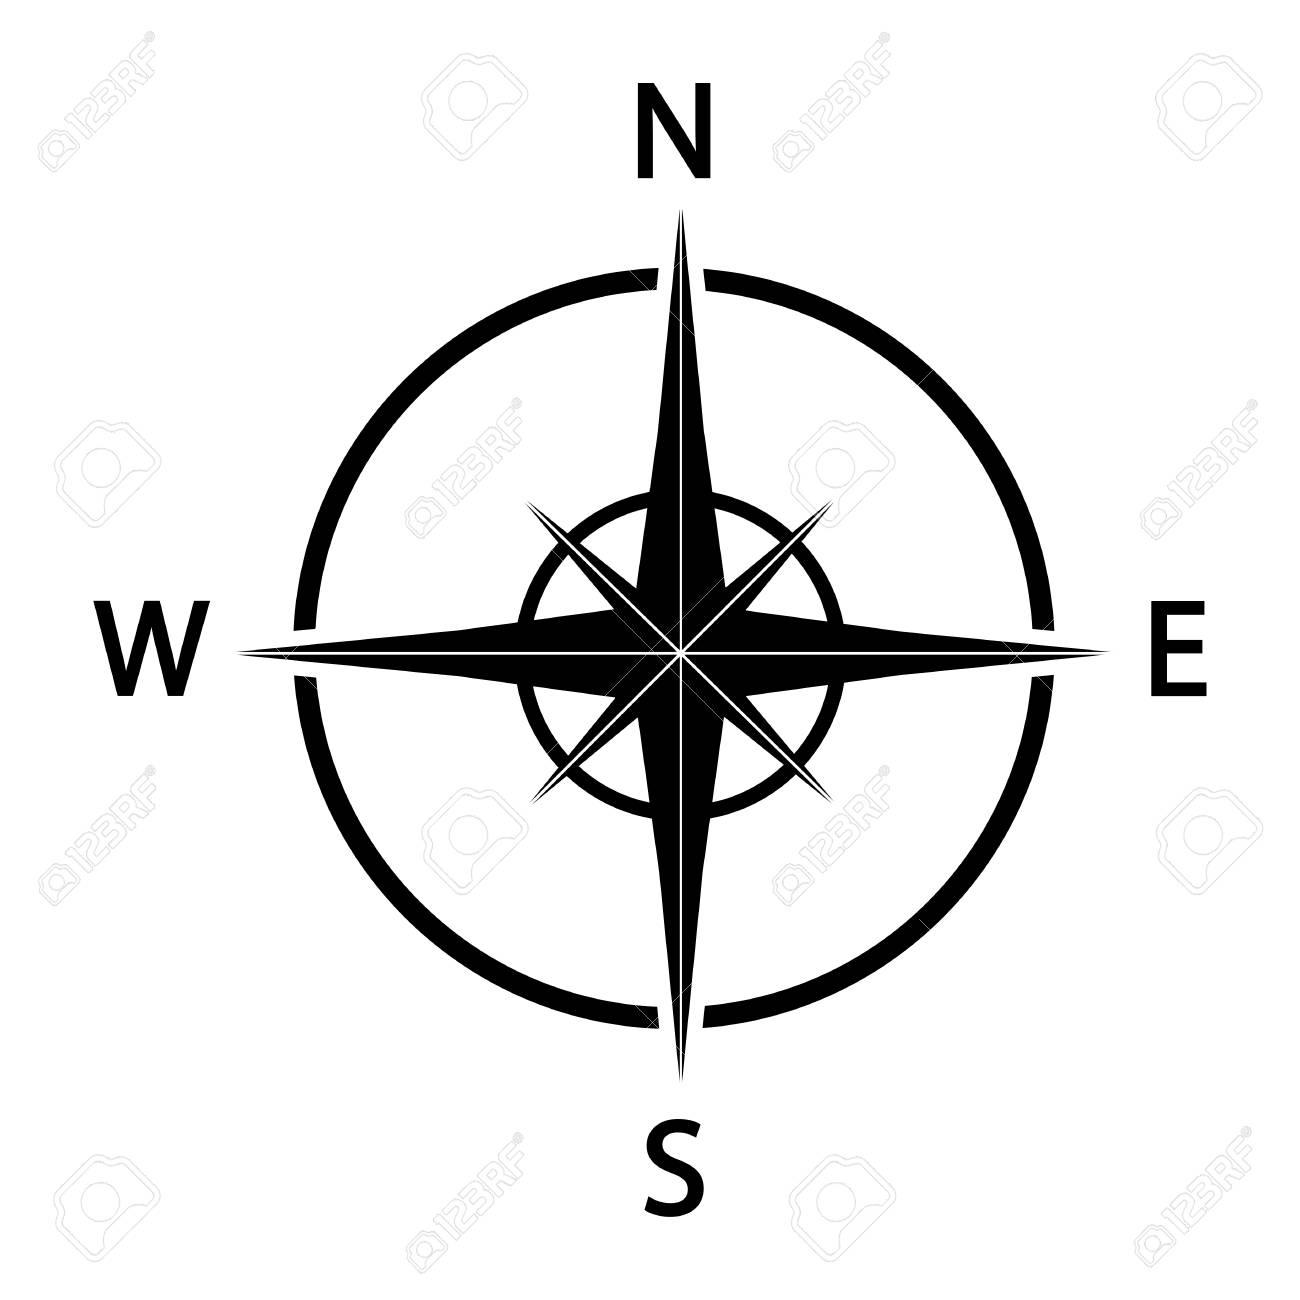 Compass icon. Black silhouette illustration. - 101187190